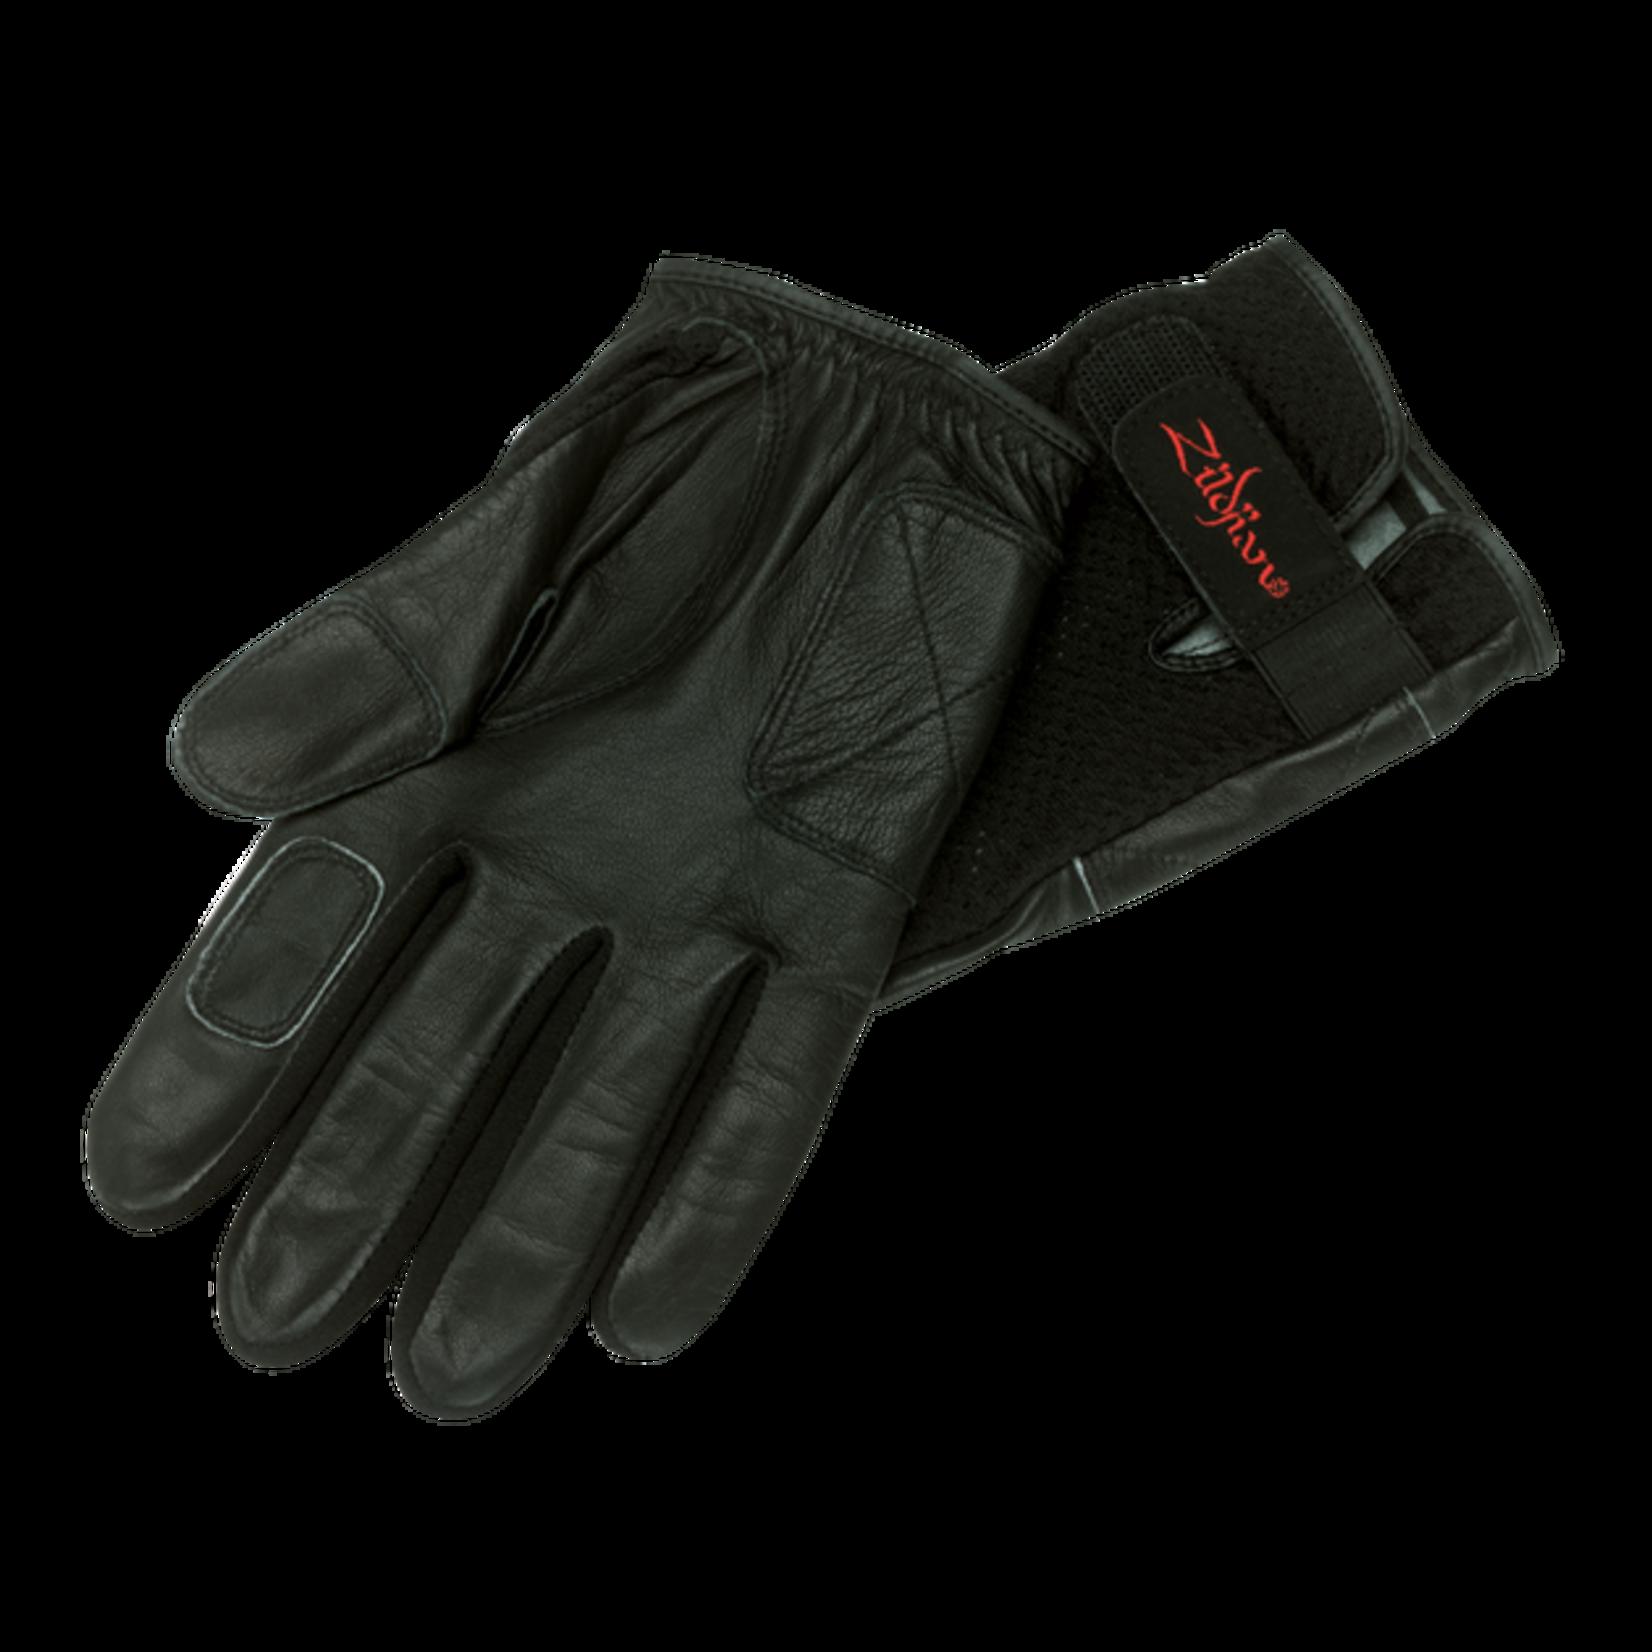 Zildjian Zildjian Drummer's Gloves - Large